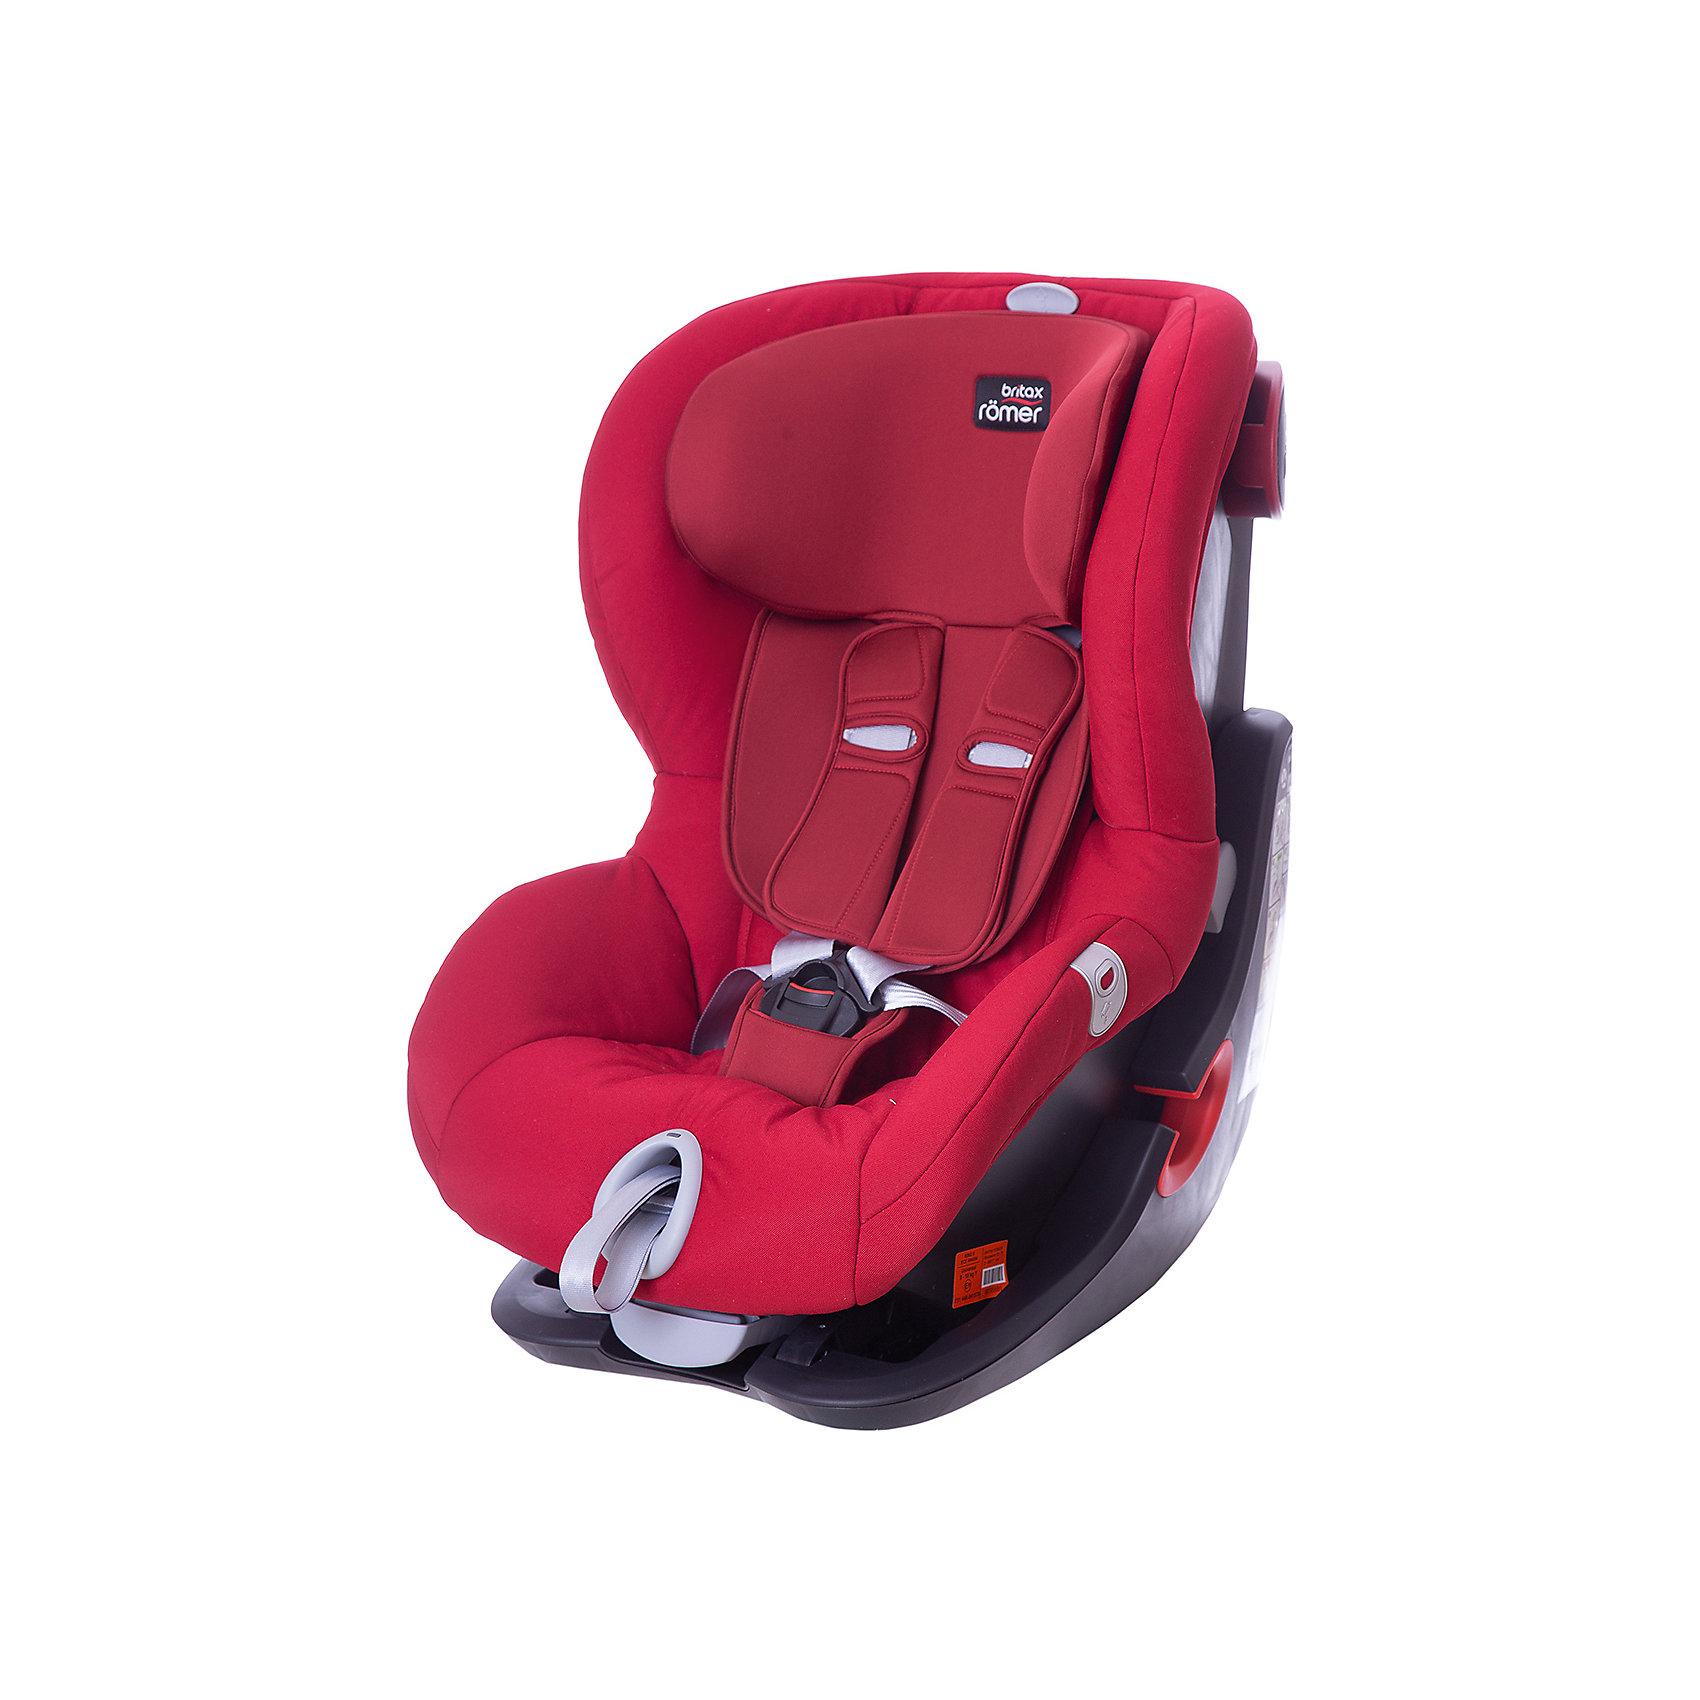 Britax Romer Автокресло Britax Romer King II LS Black Series 9-18 кг, Flame Red Trendline